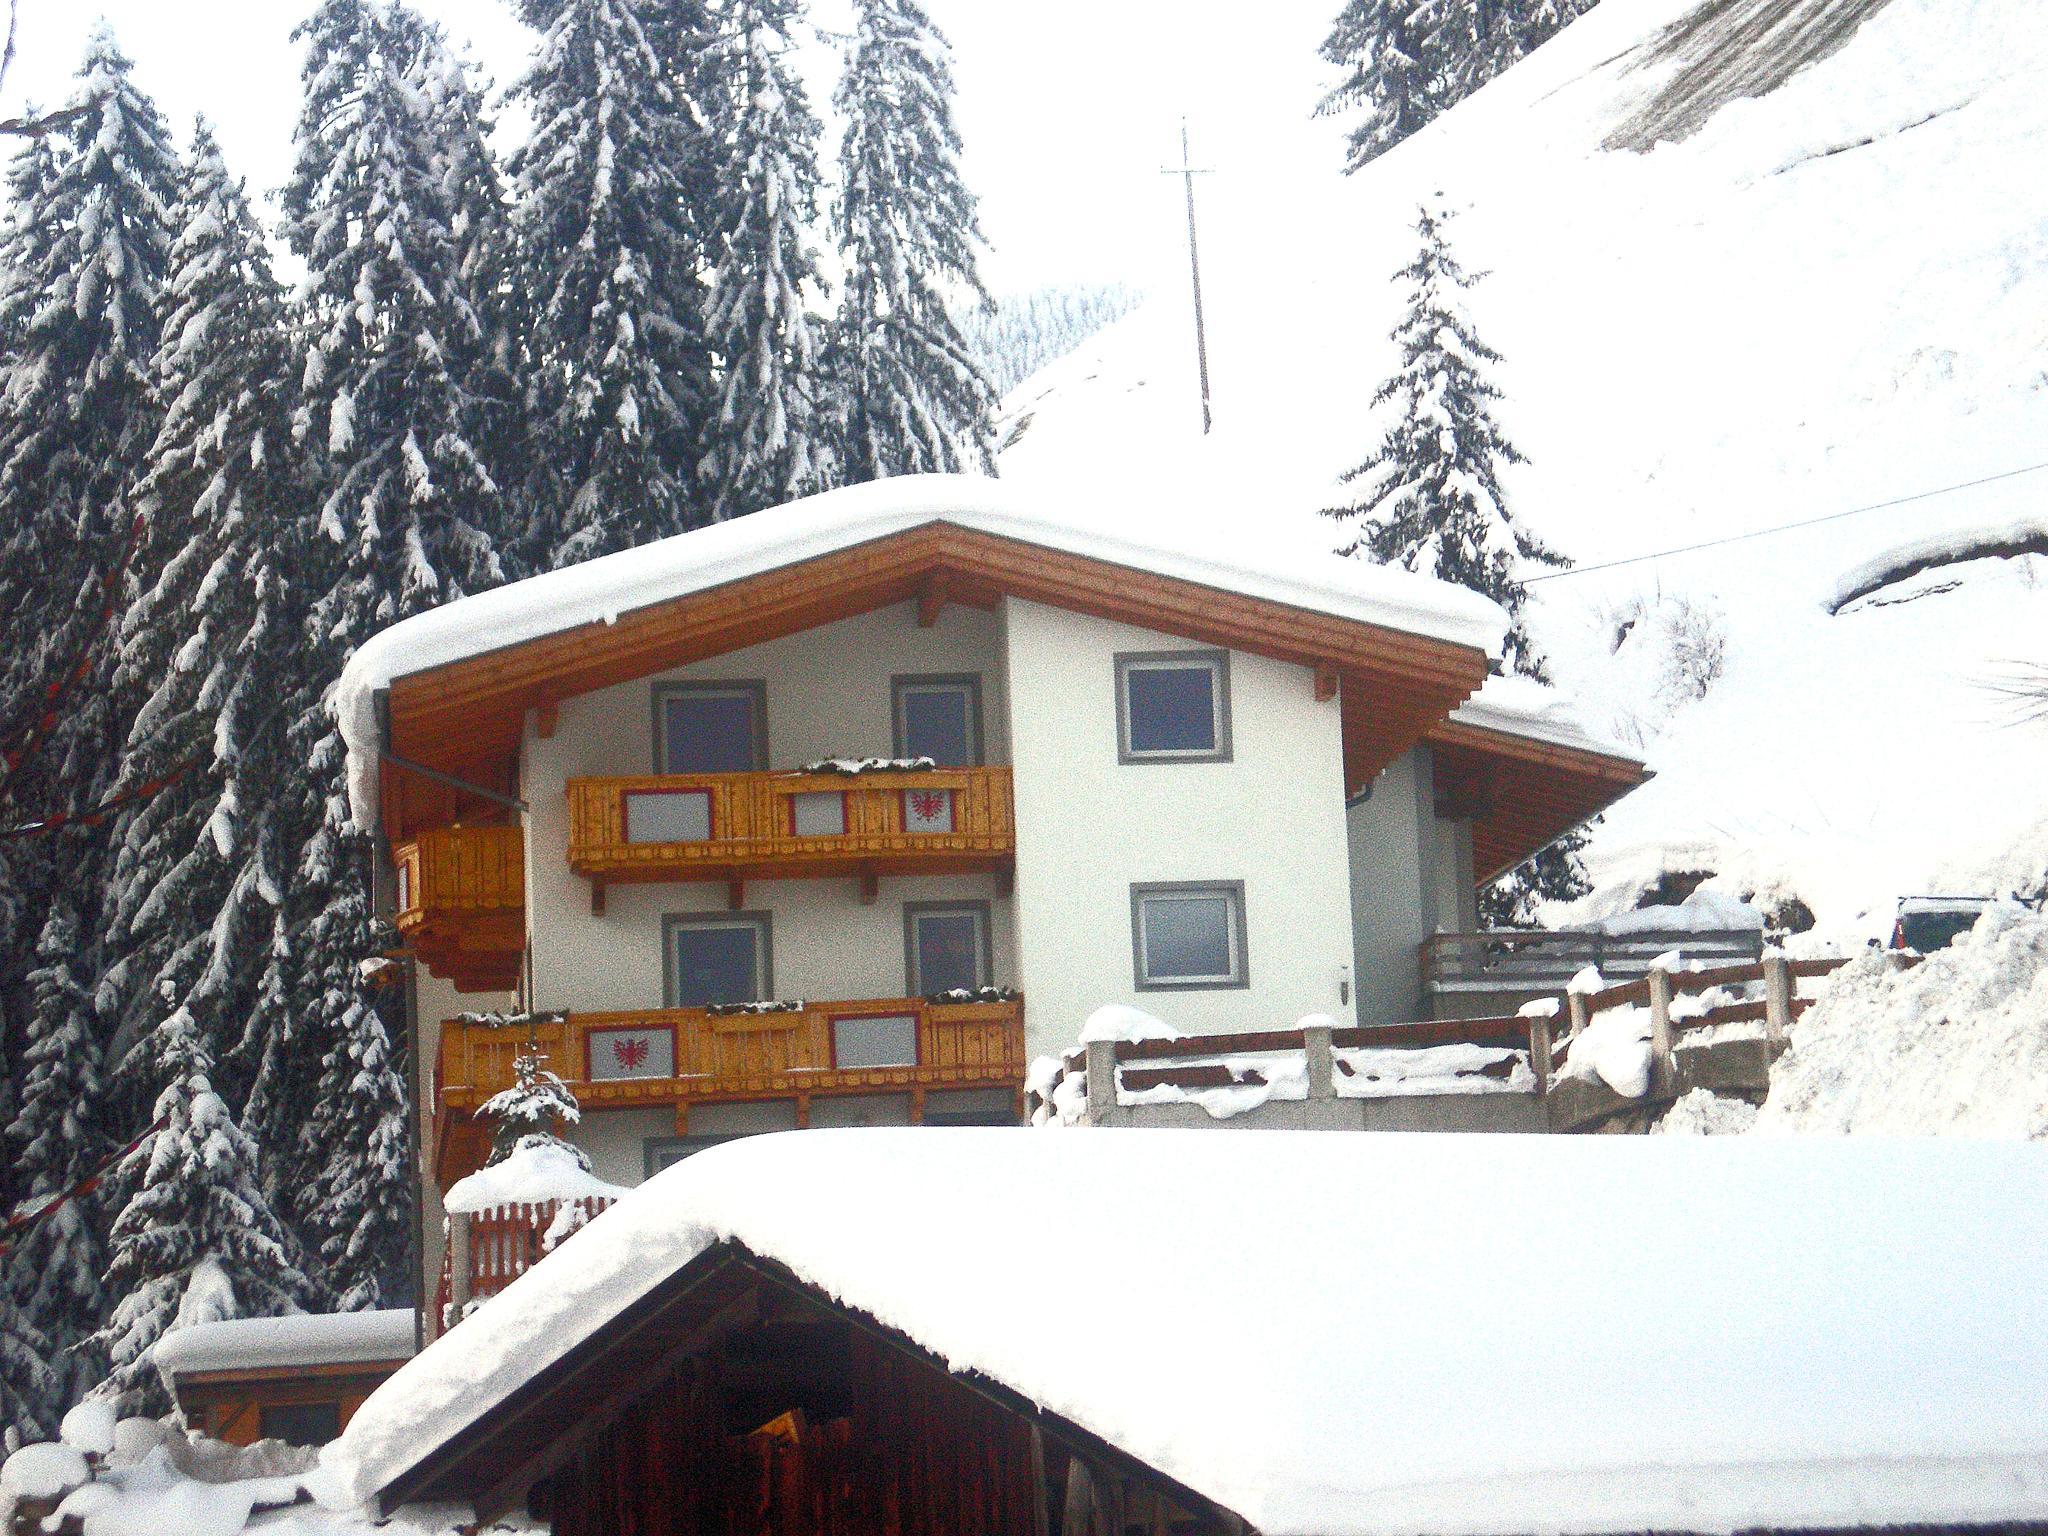 Ferienhaus Tenndl II Tirol